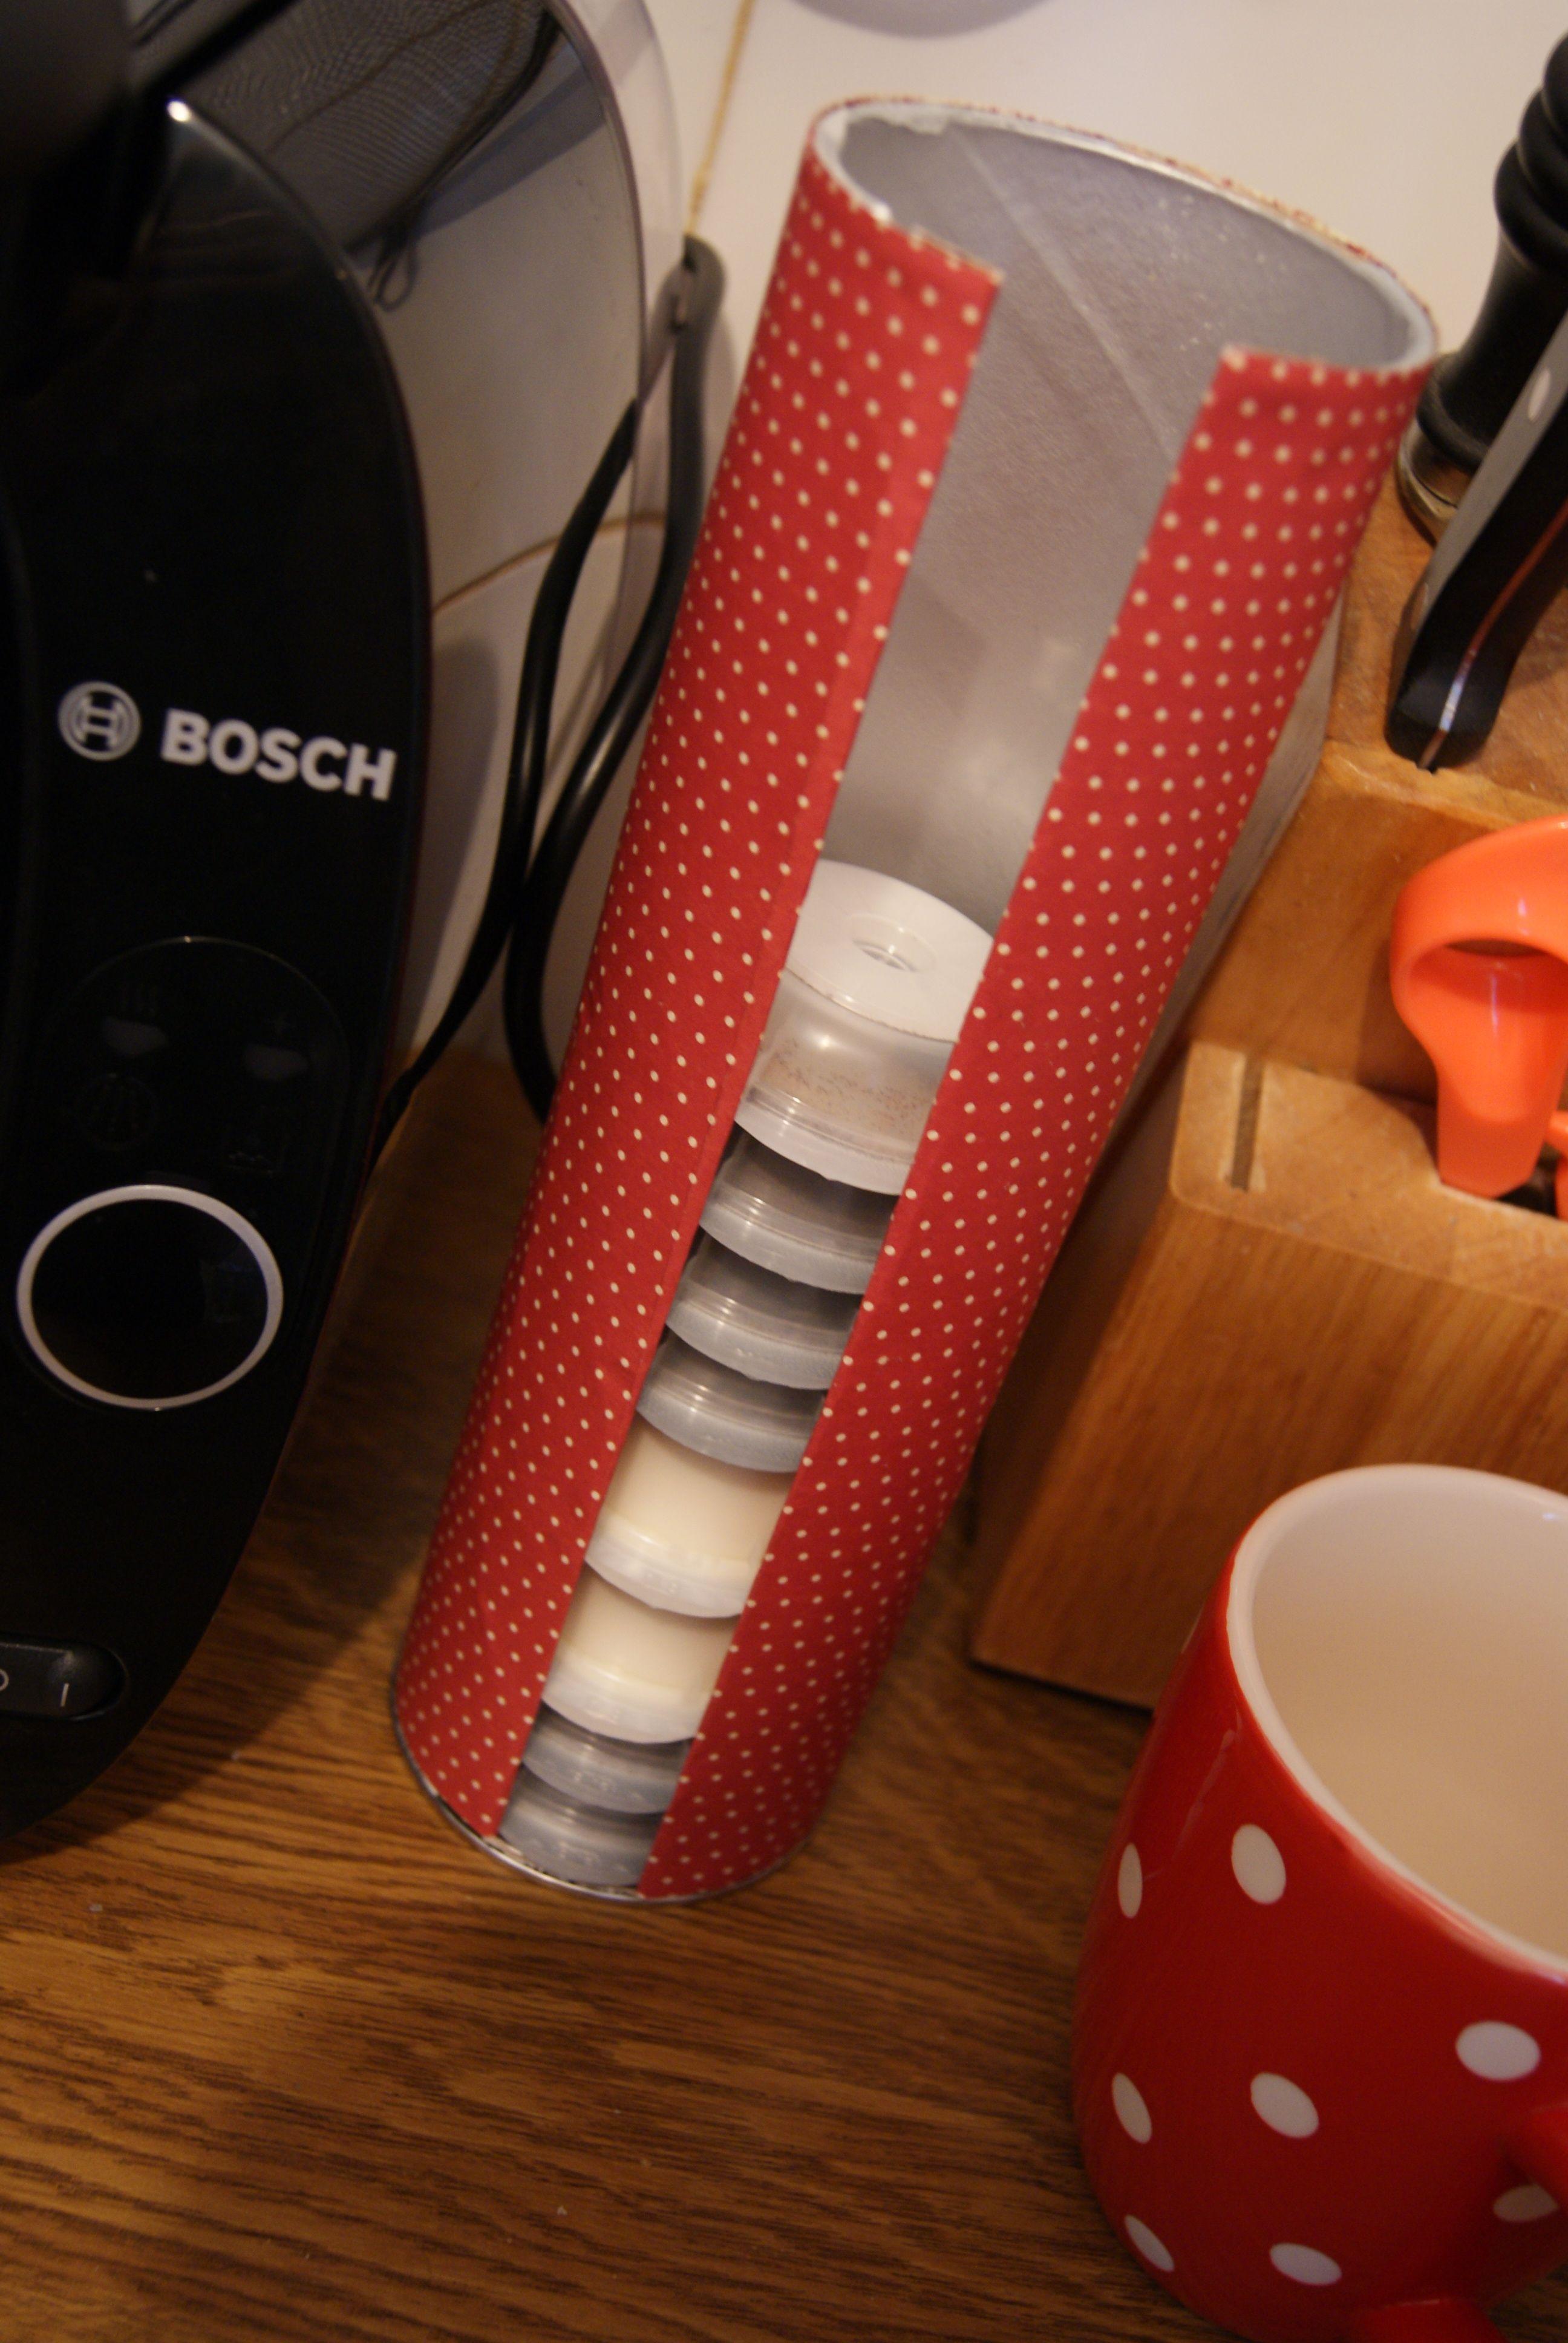 Diy Tassimo Pod Holder Made With A Pringles Tube And Pretty Paper Tassimo Pod Holder Tassimo Diy